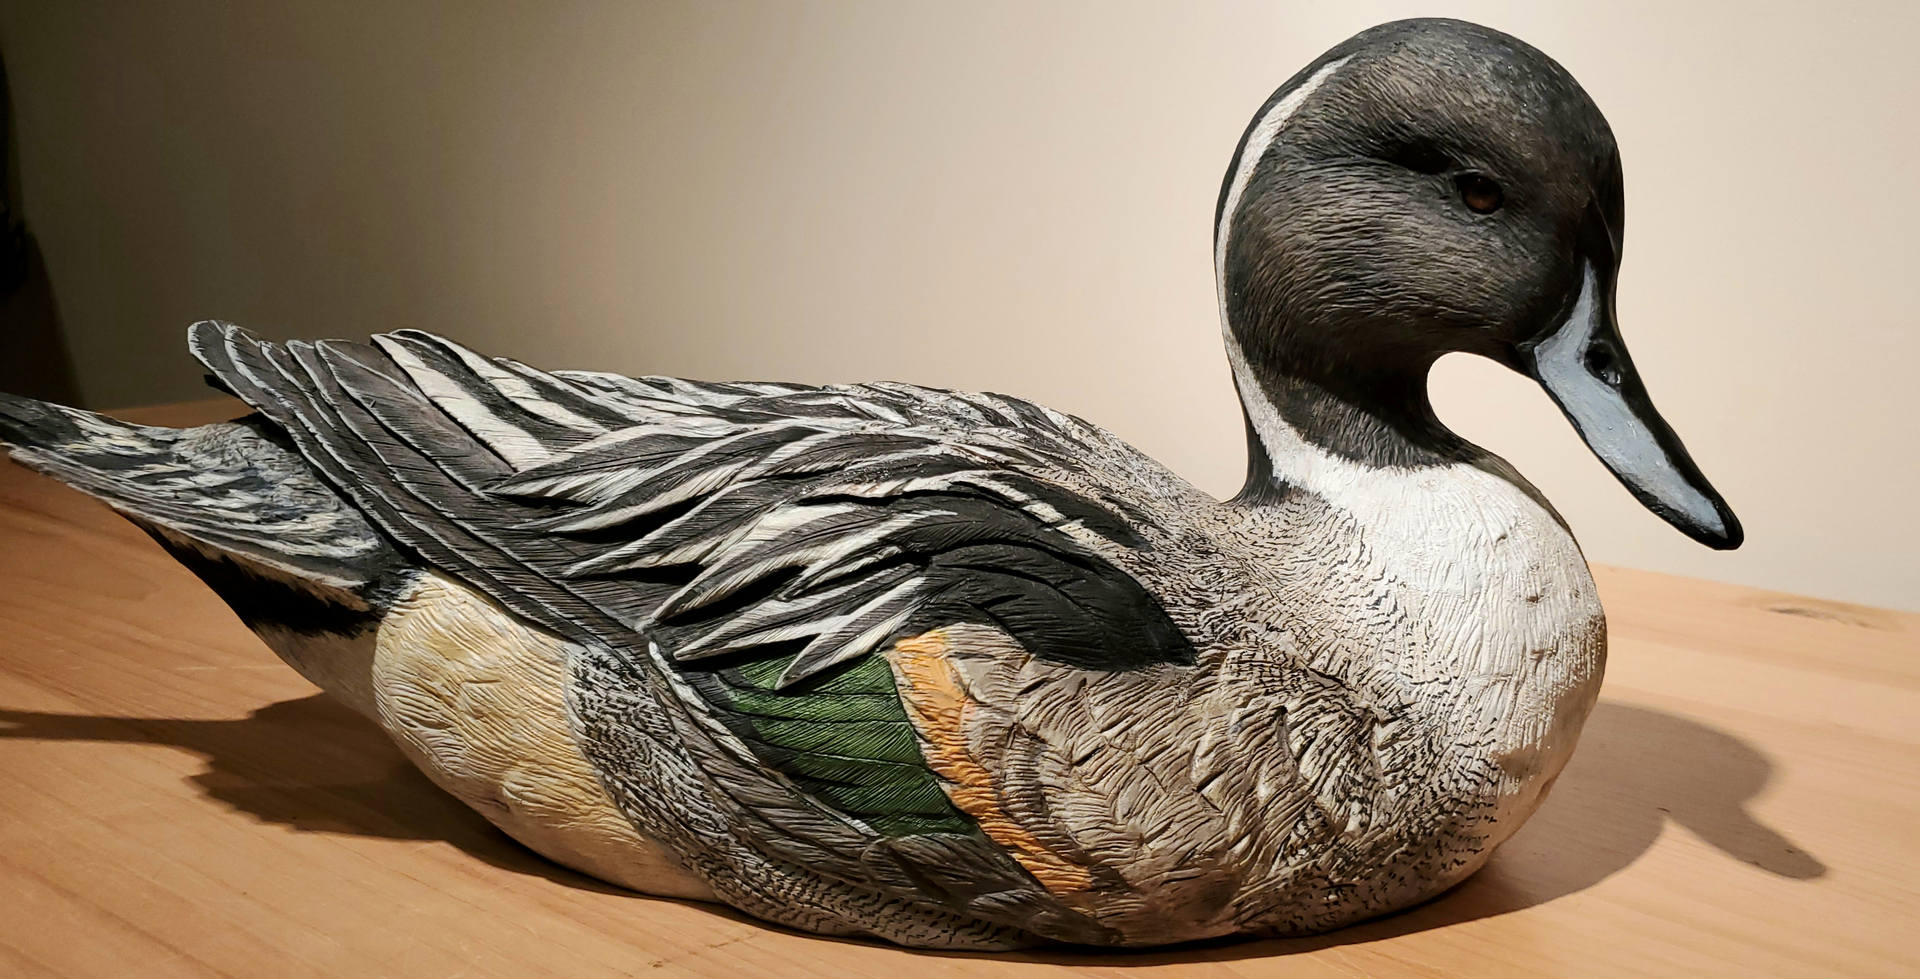 dating wooden duck decoys britisk indisk homoseksuel dating